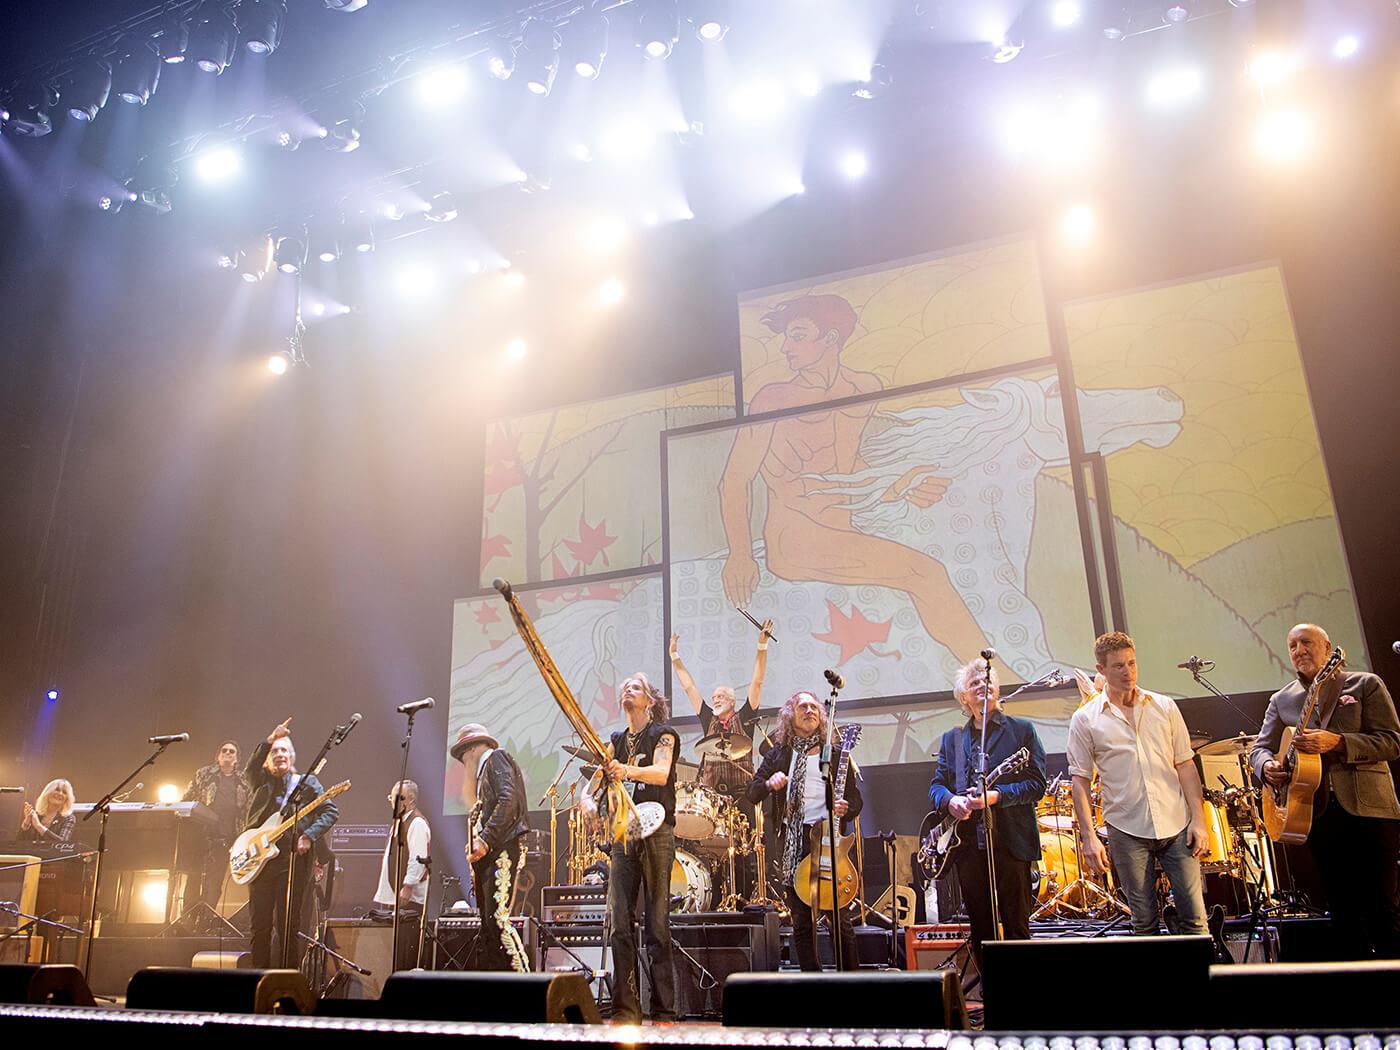 Mick Fleetwood's Peter Green tribute comes to cinemas